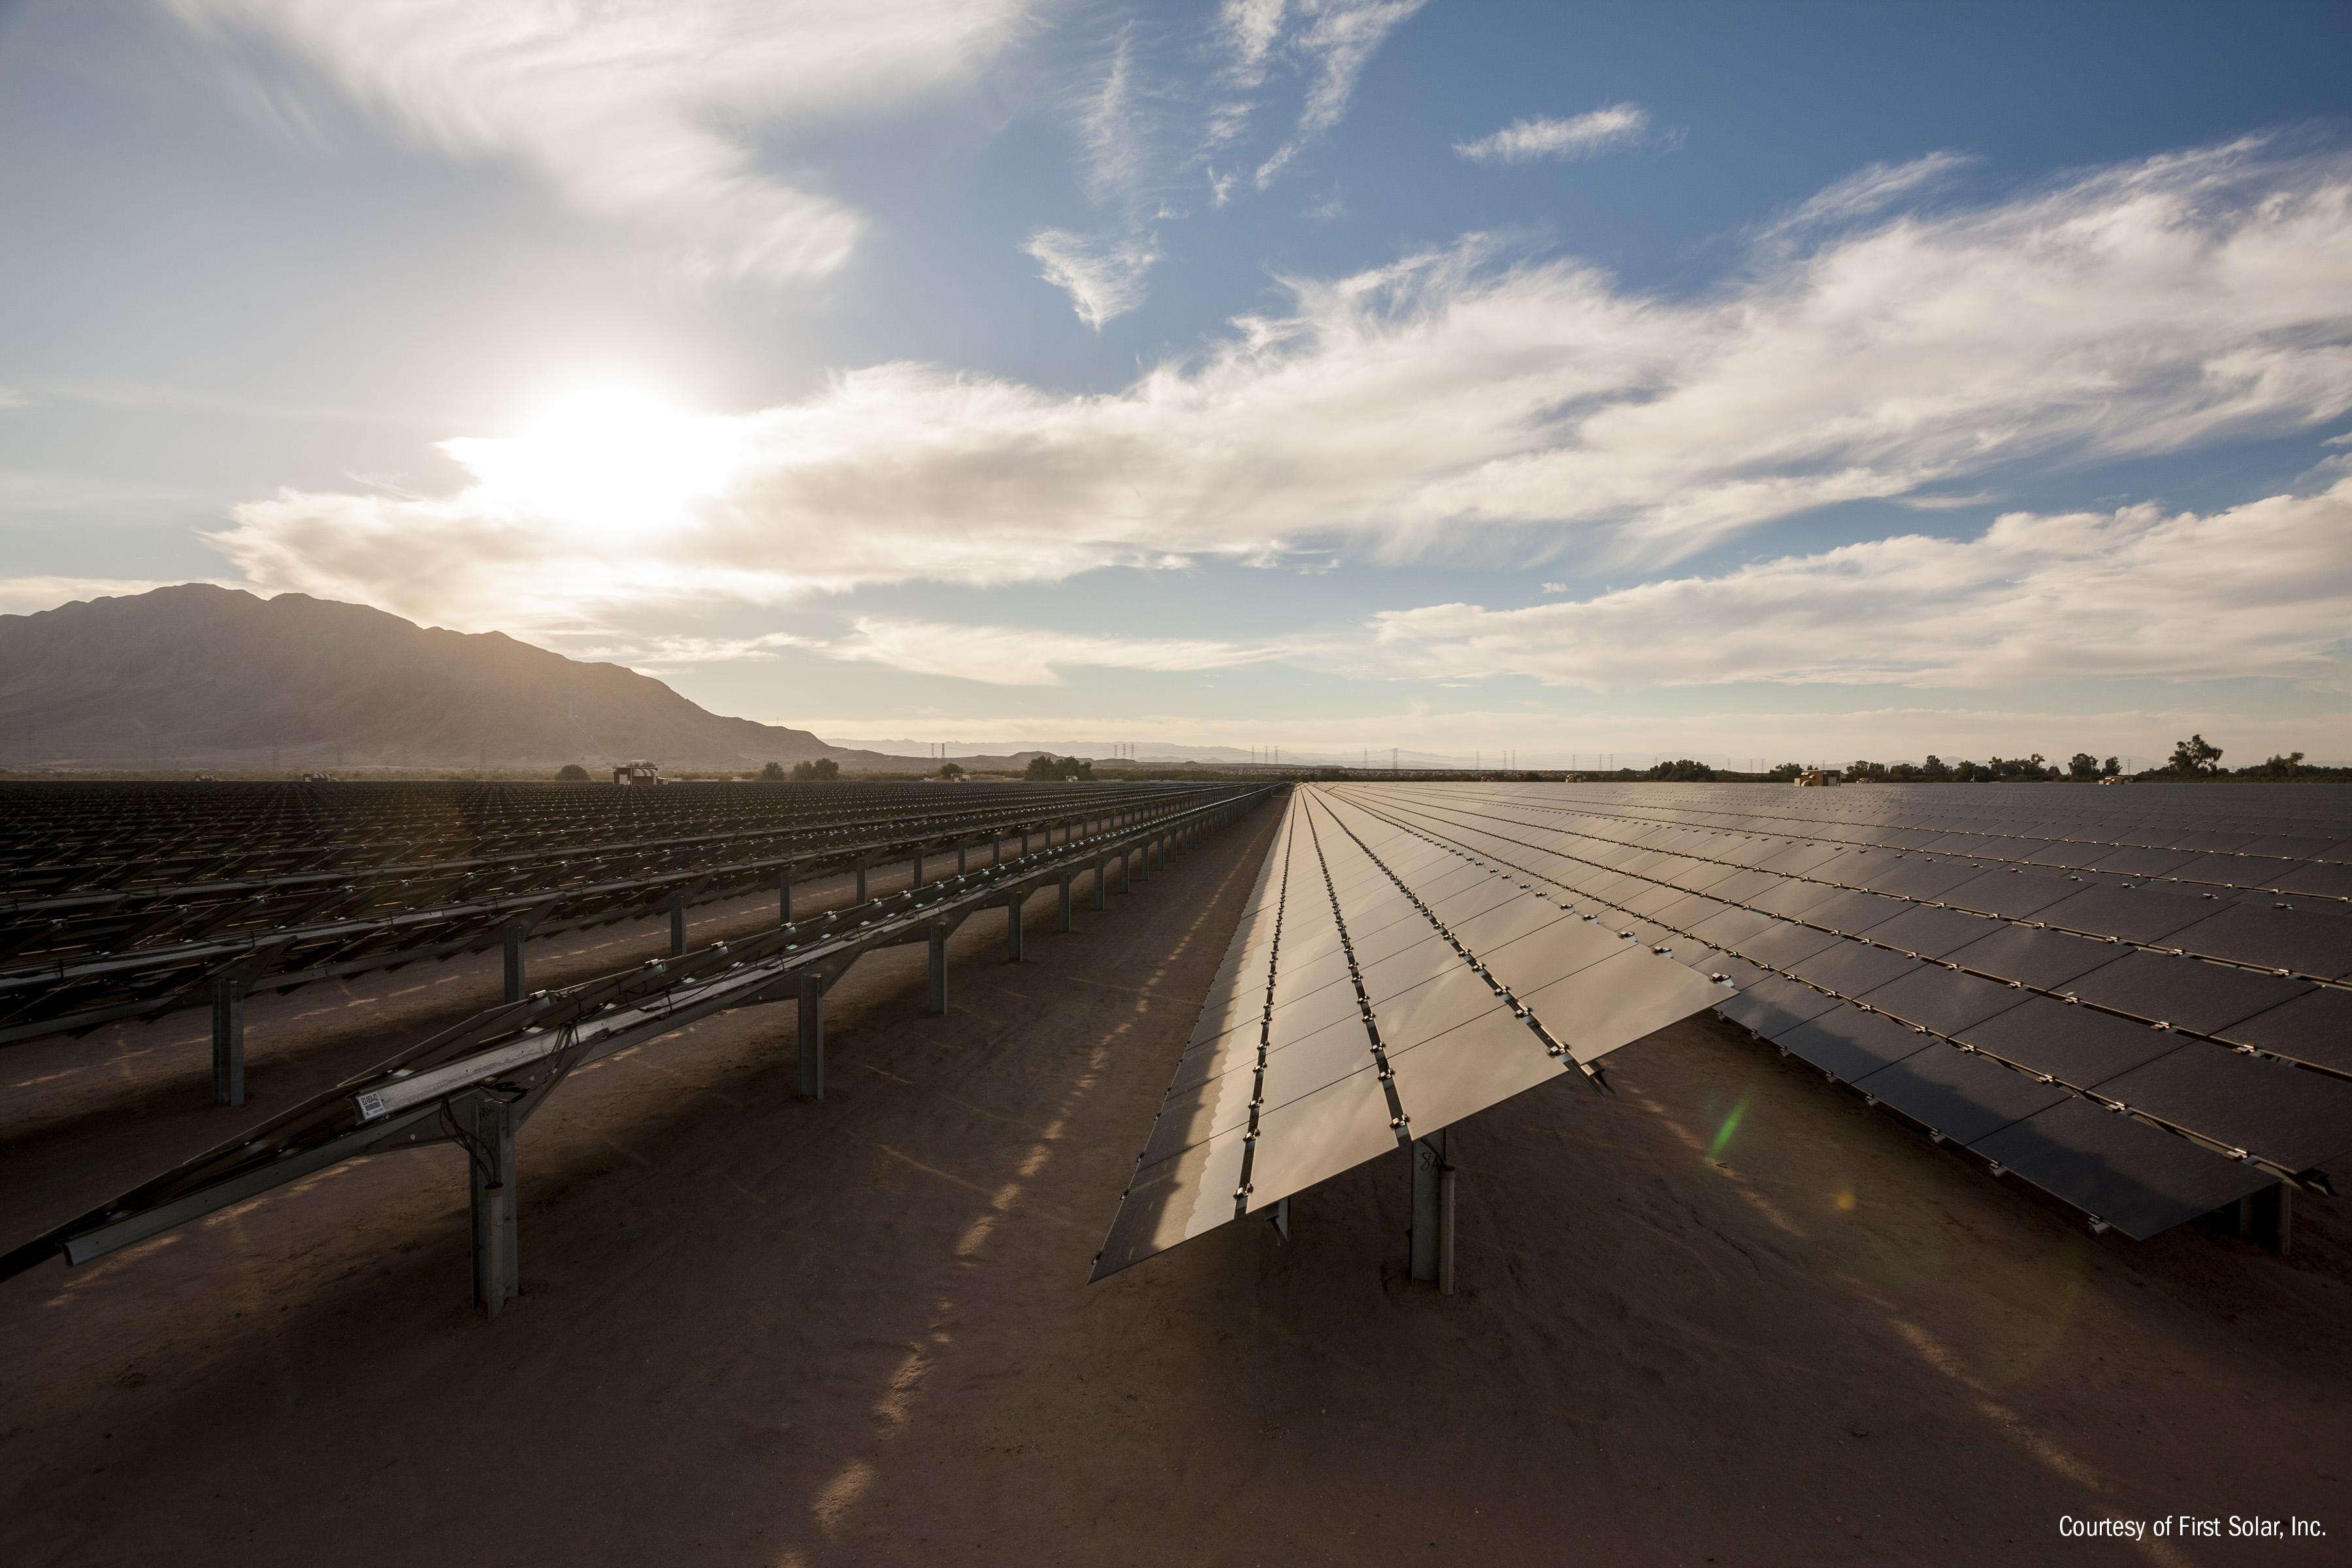 Solar farm in the desert.